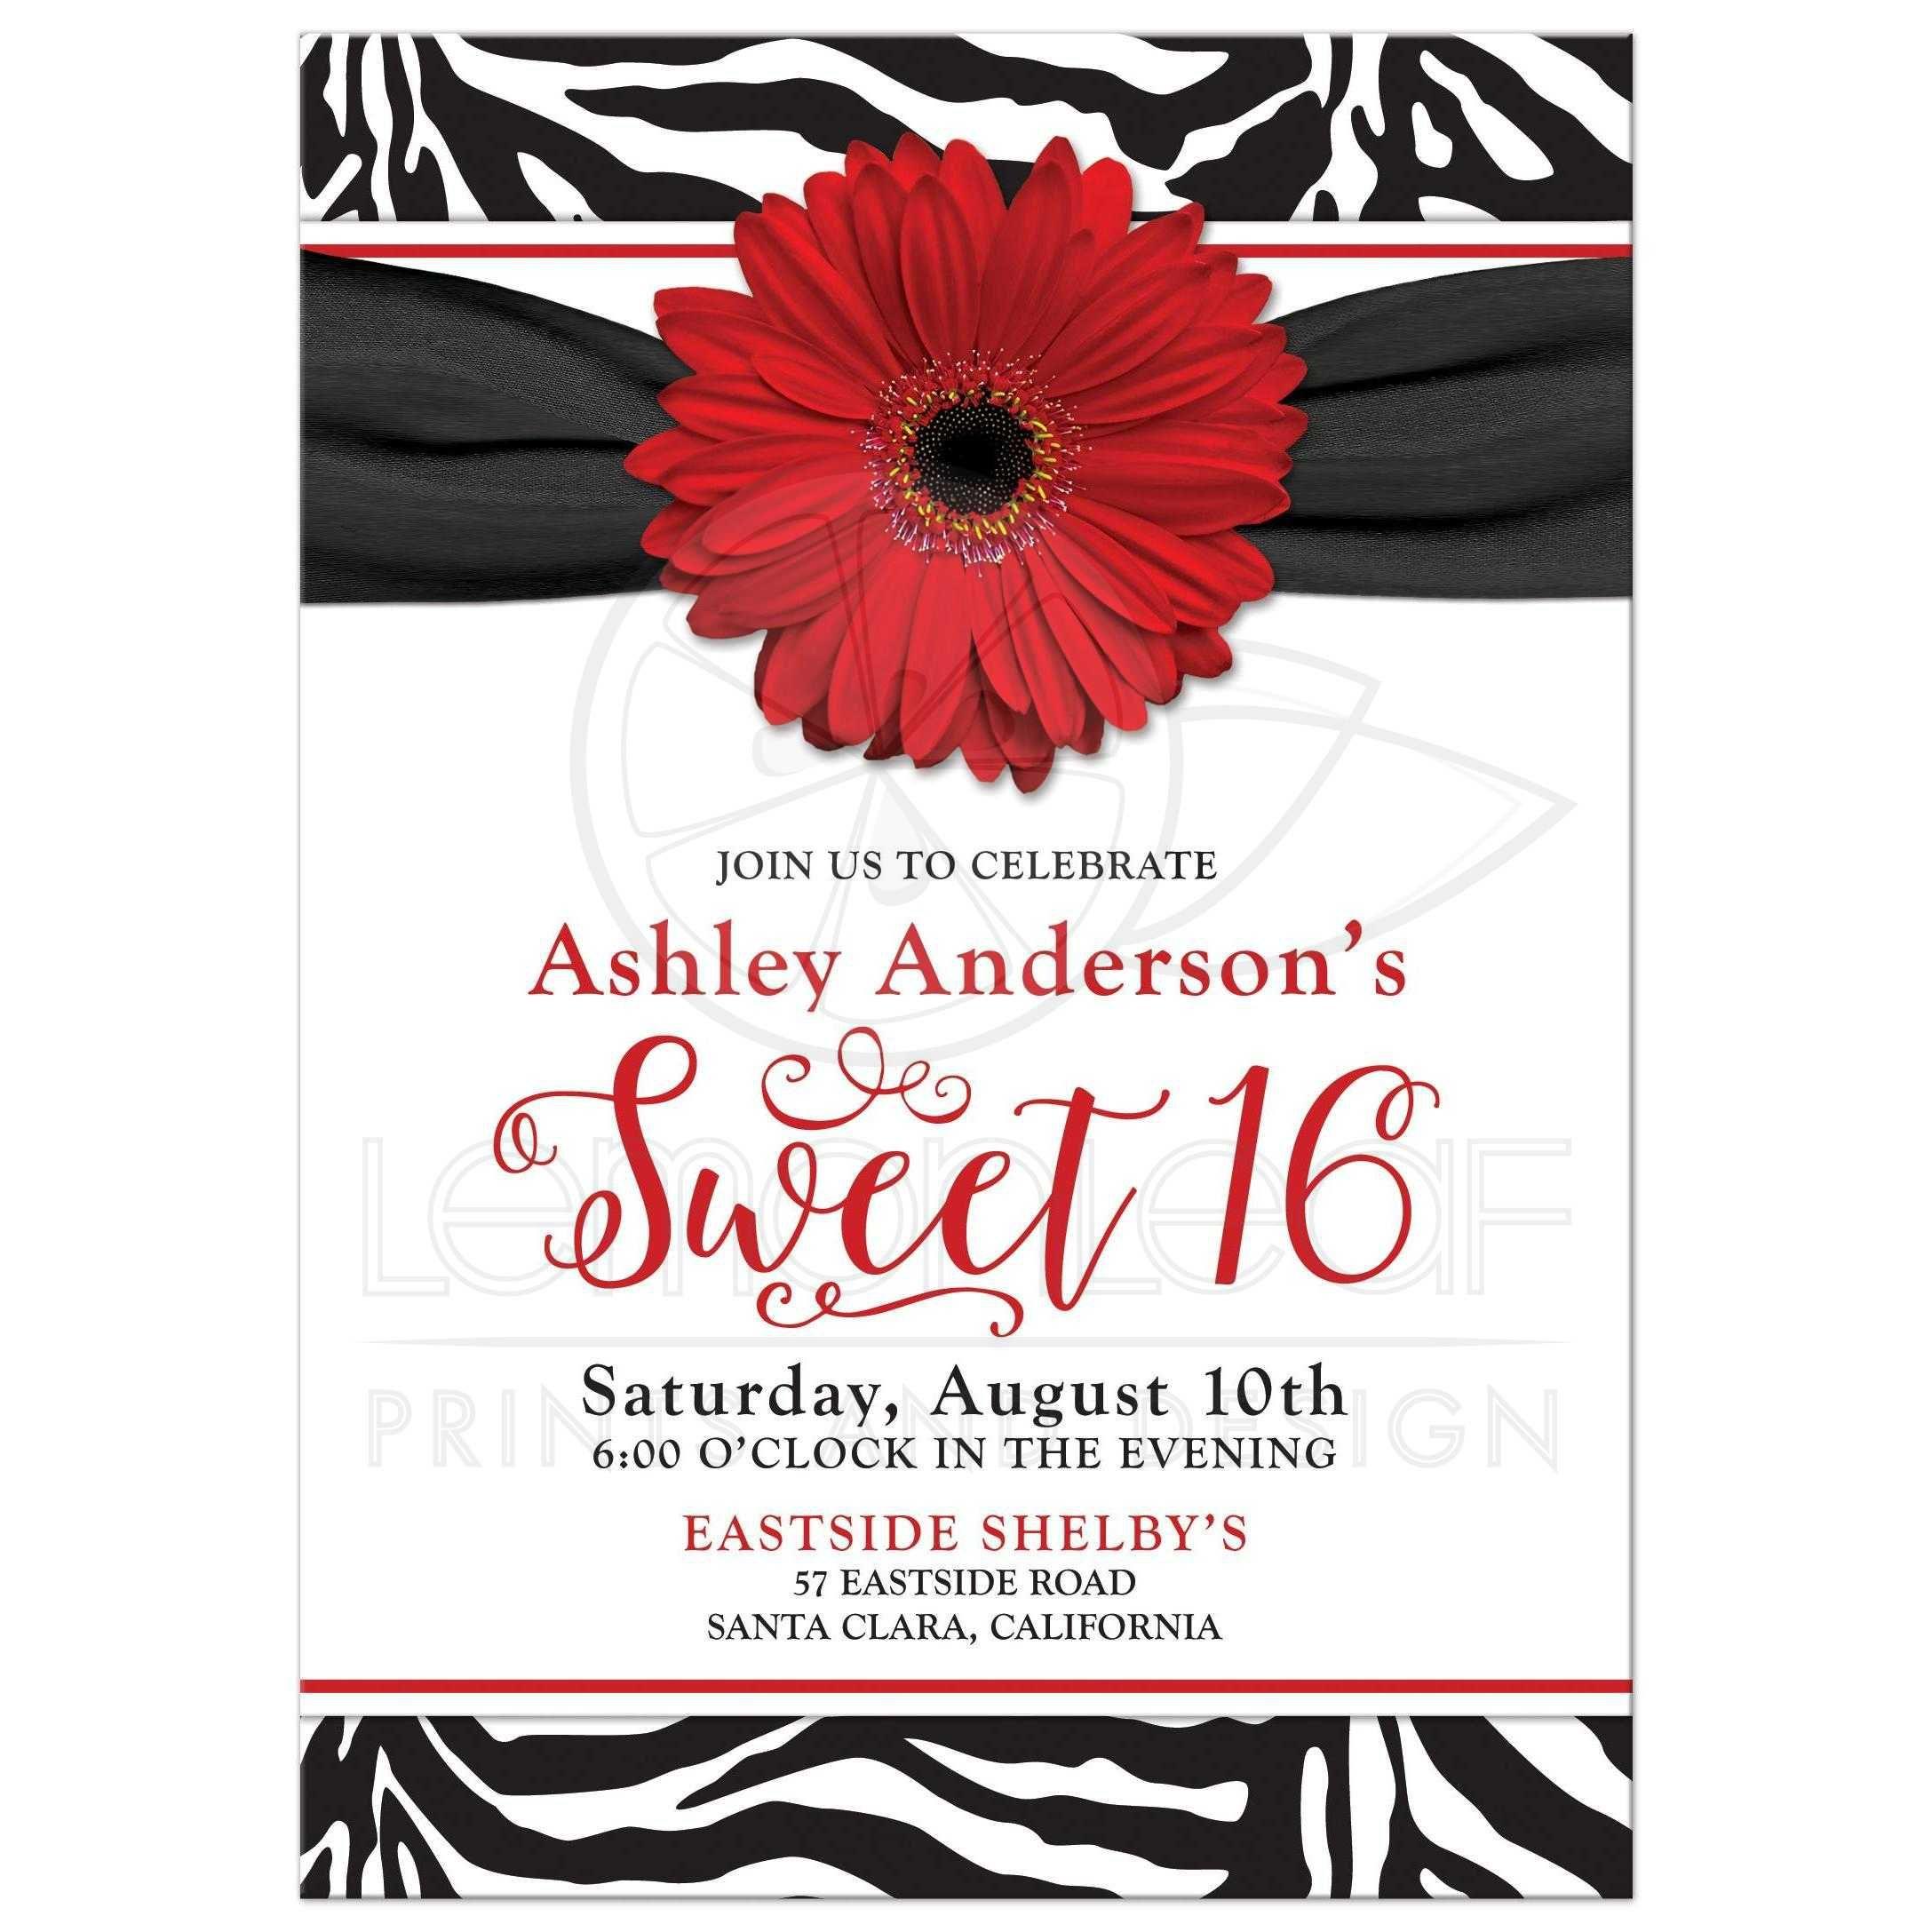 Birthday Invitation Templates Birthday Invitation Templates Word - Sweet 16 invitations templates